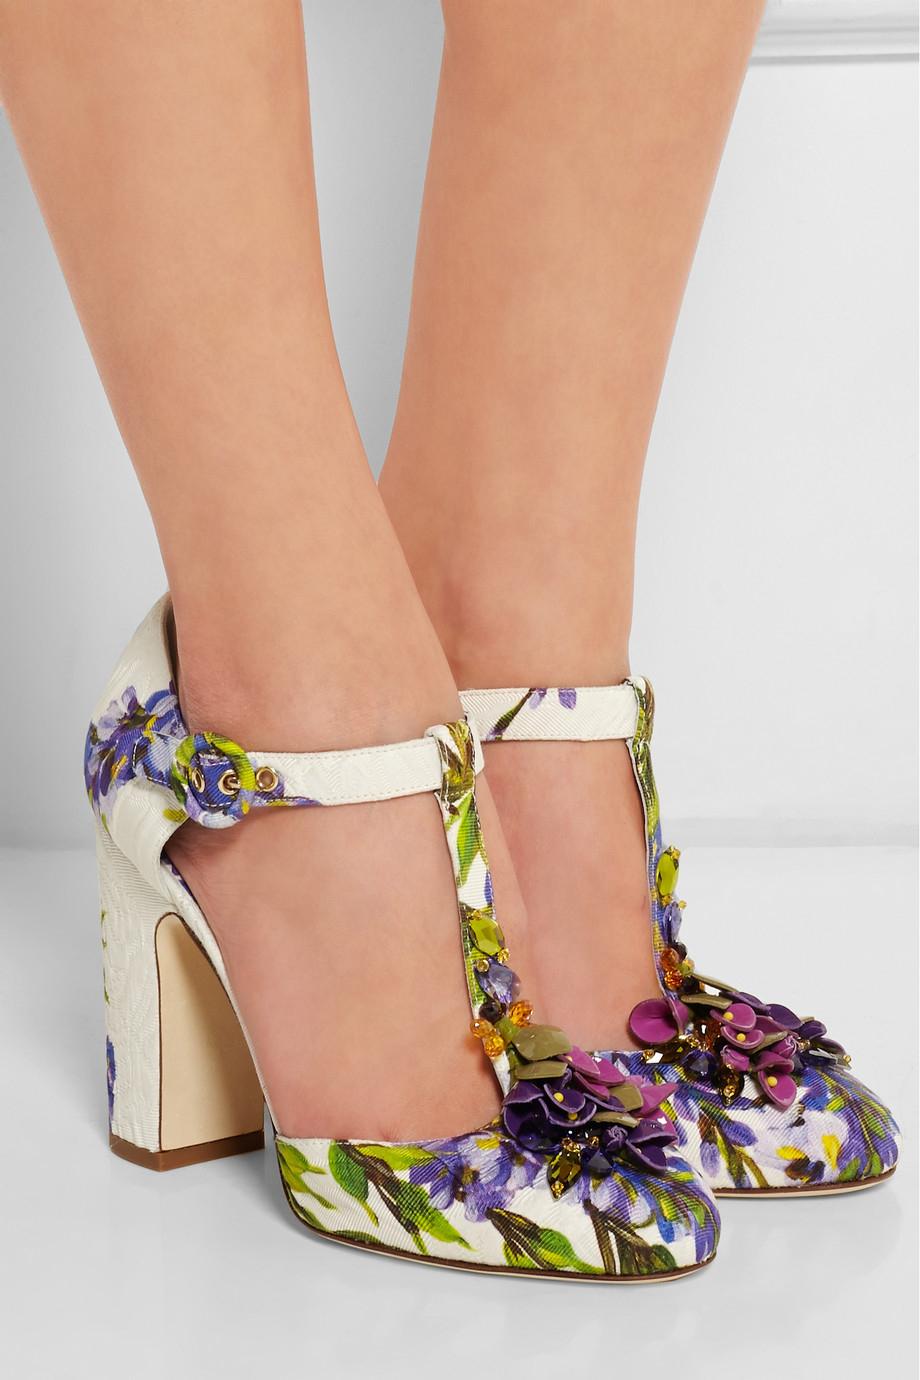 Dolce & Gabbana Brocade pumps BNukPtlIBd